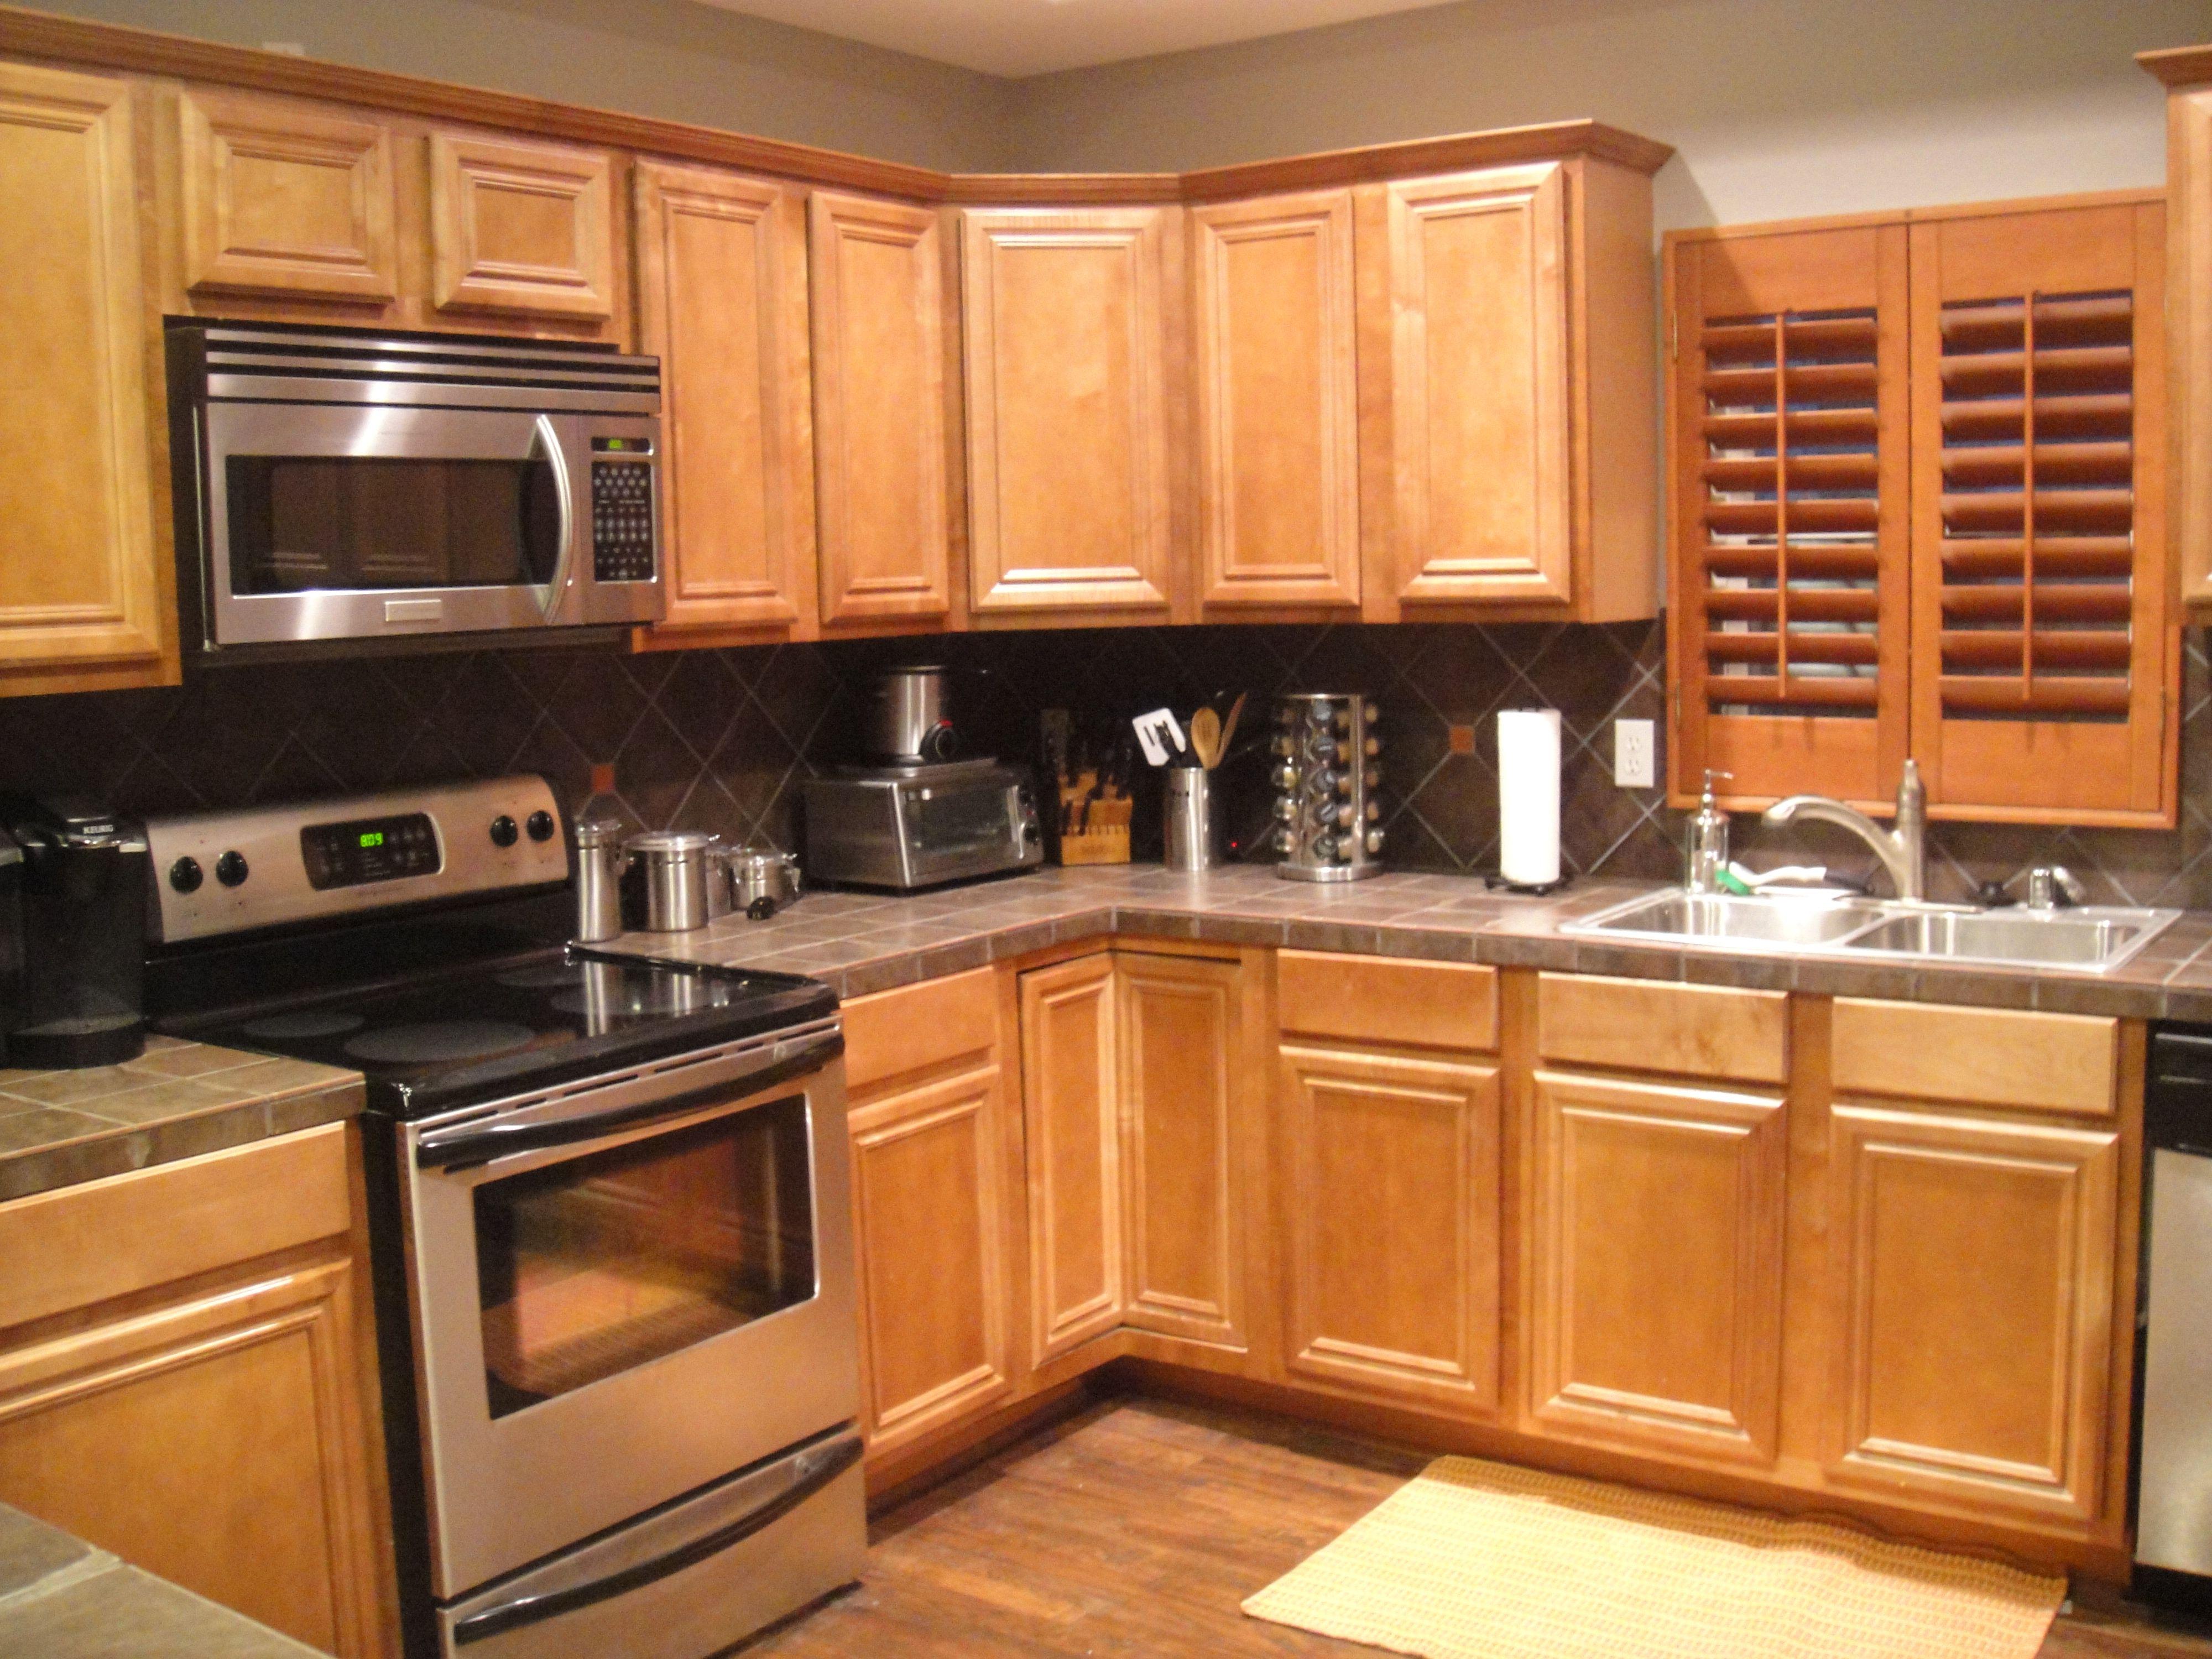 Kitchen Remodelaholic Complete Kitchen Transformation